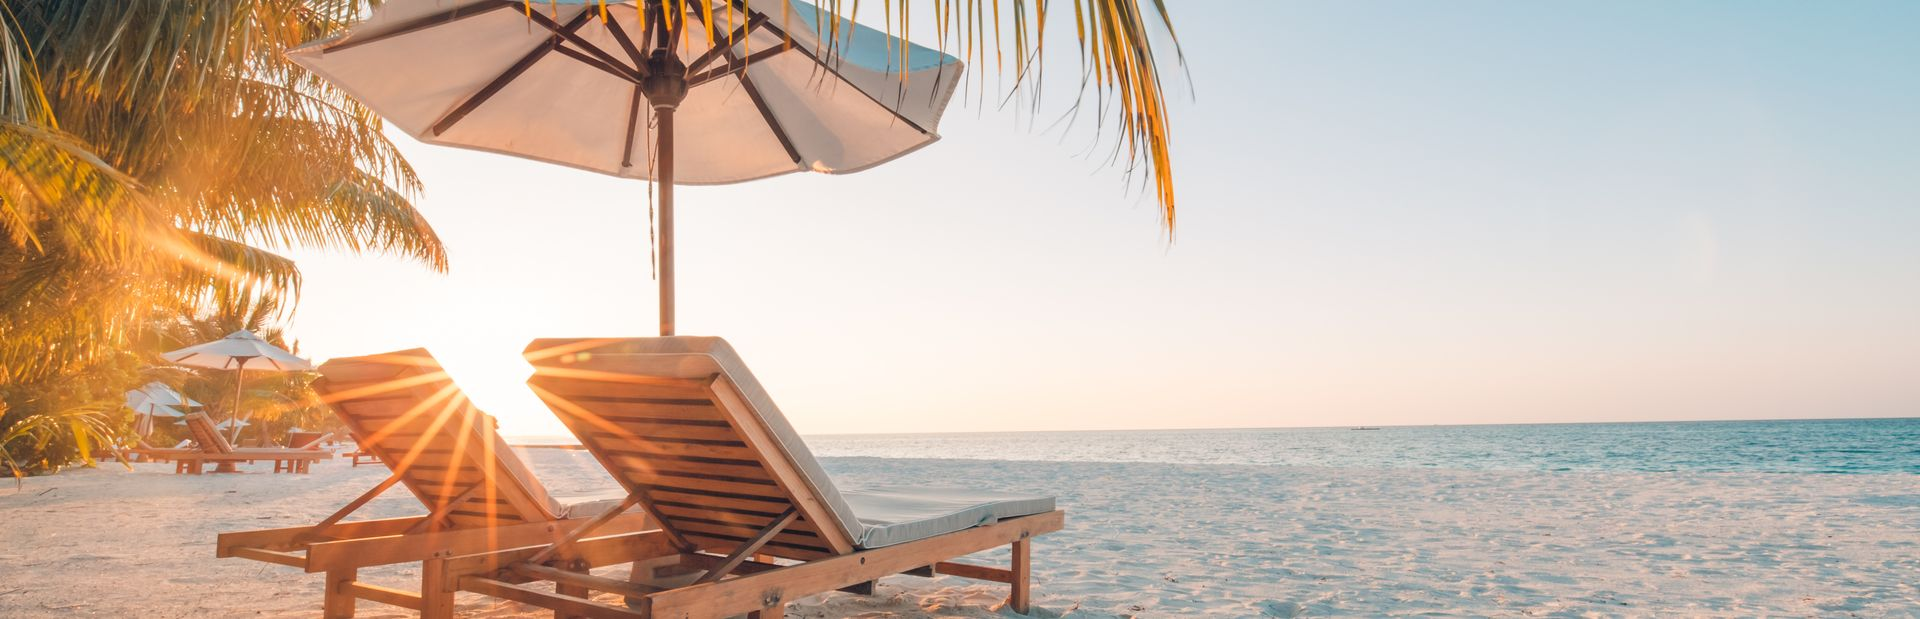 10 top spas to enjoy on a Caribbean yacht charter